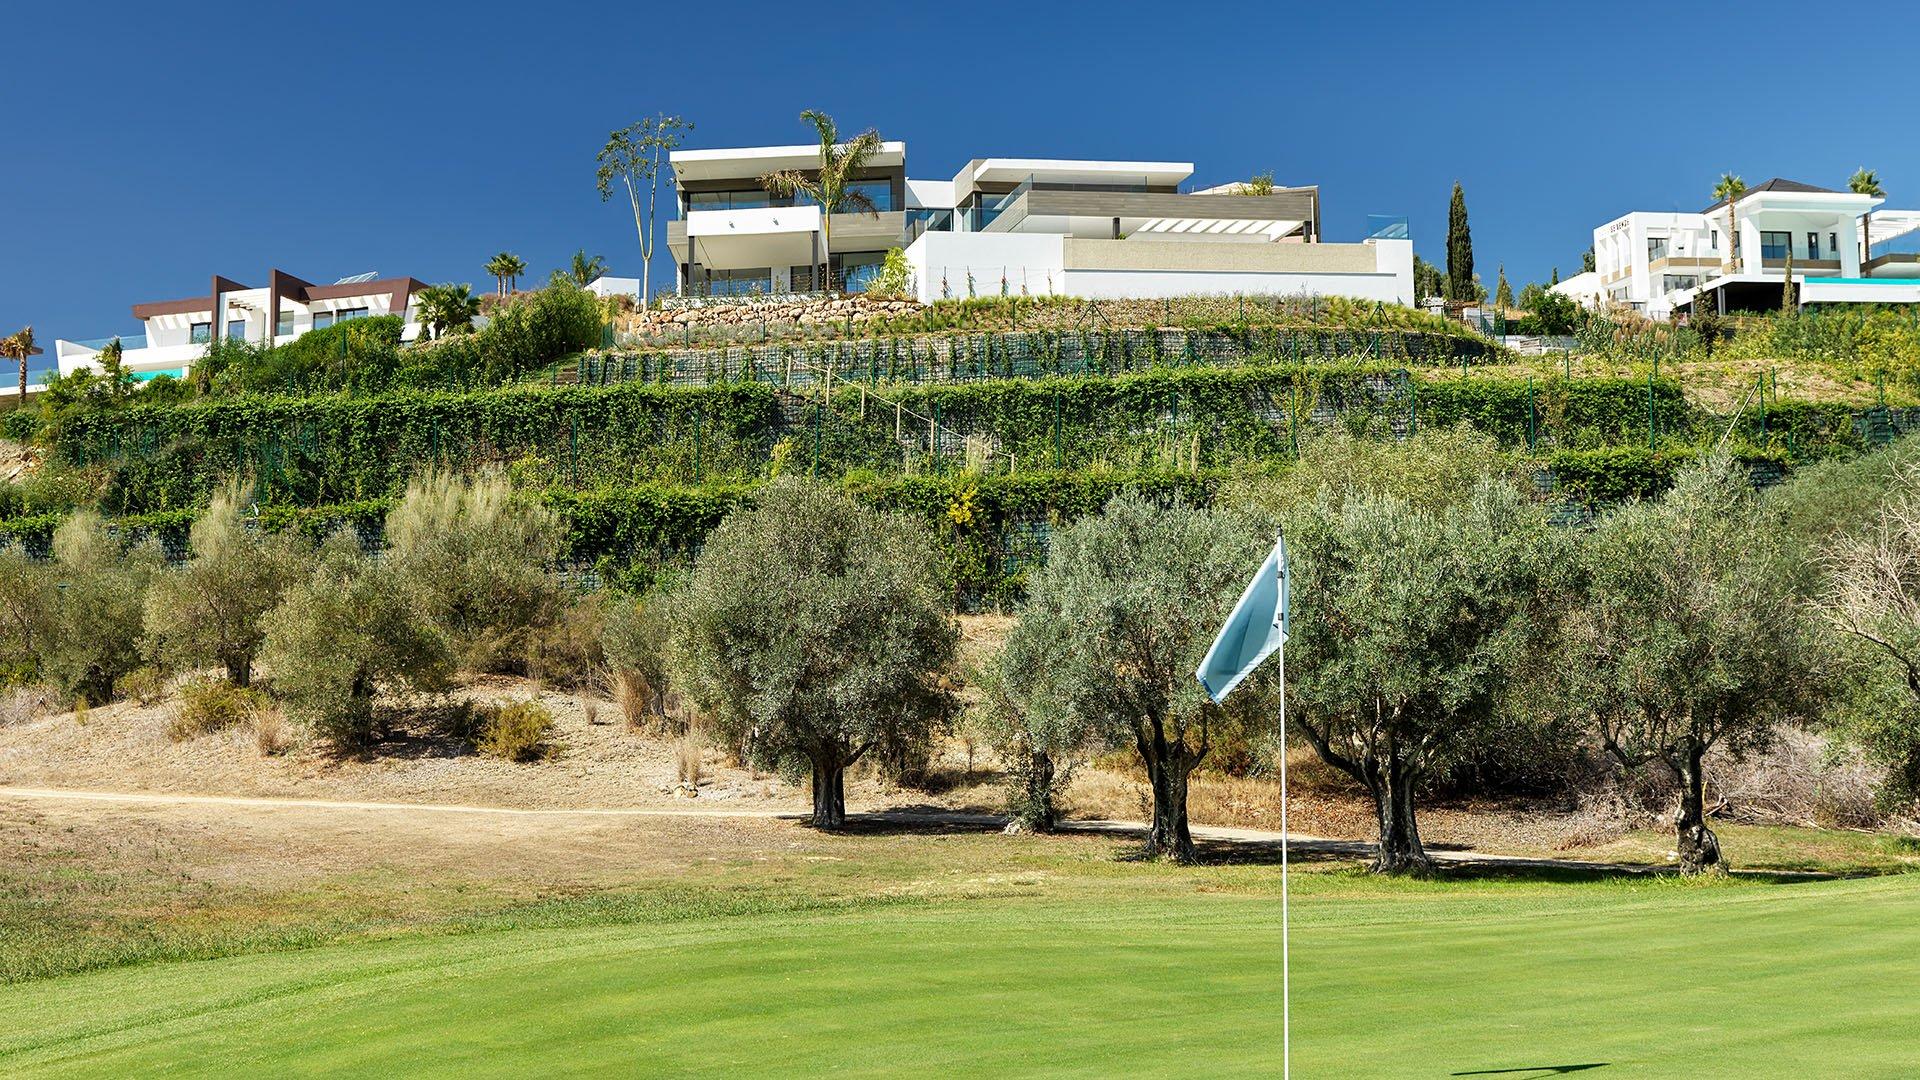 Villa The Vy: Beautiful contemporary villa with sensational golf and sea views